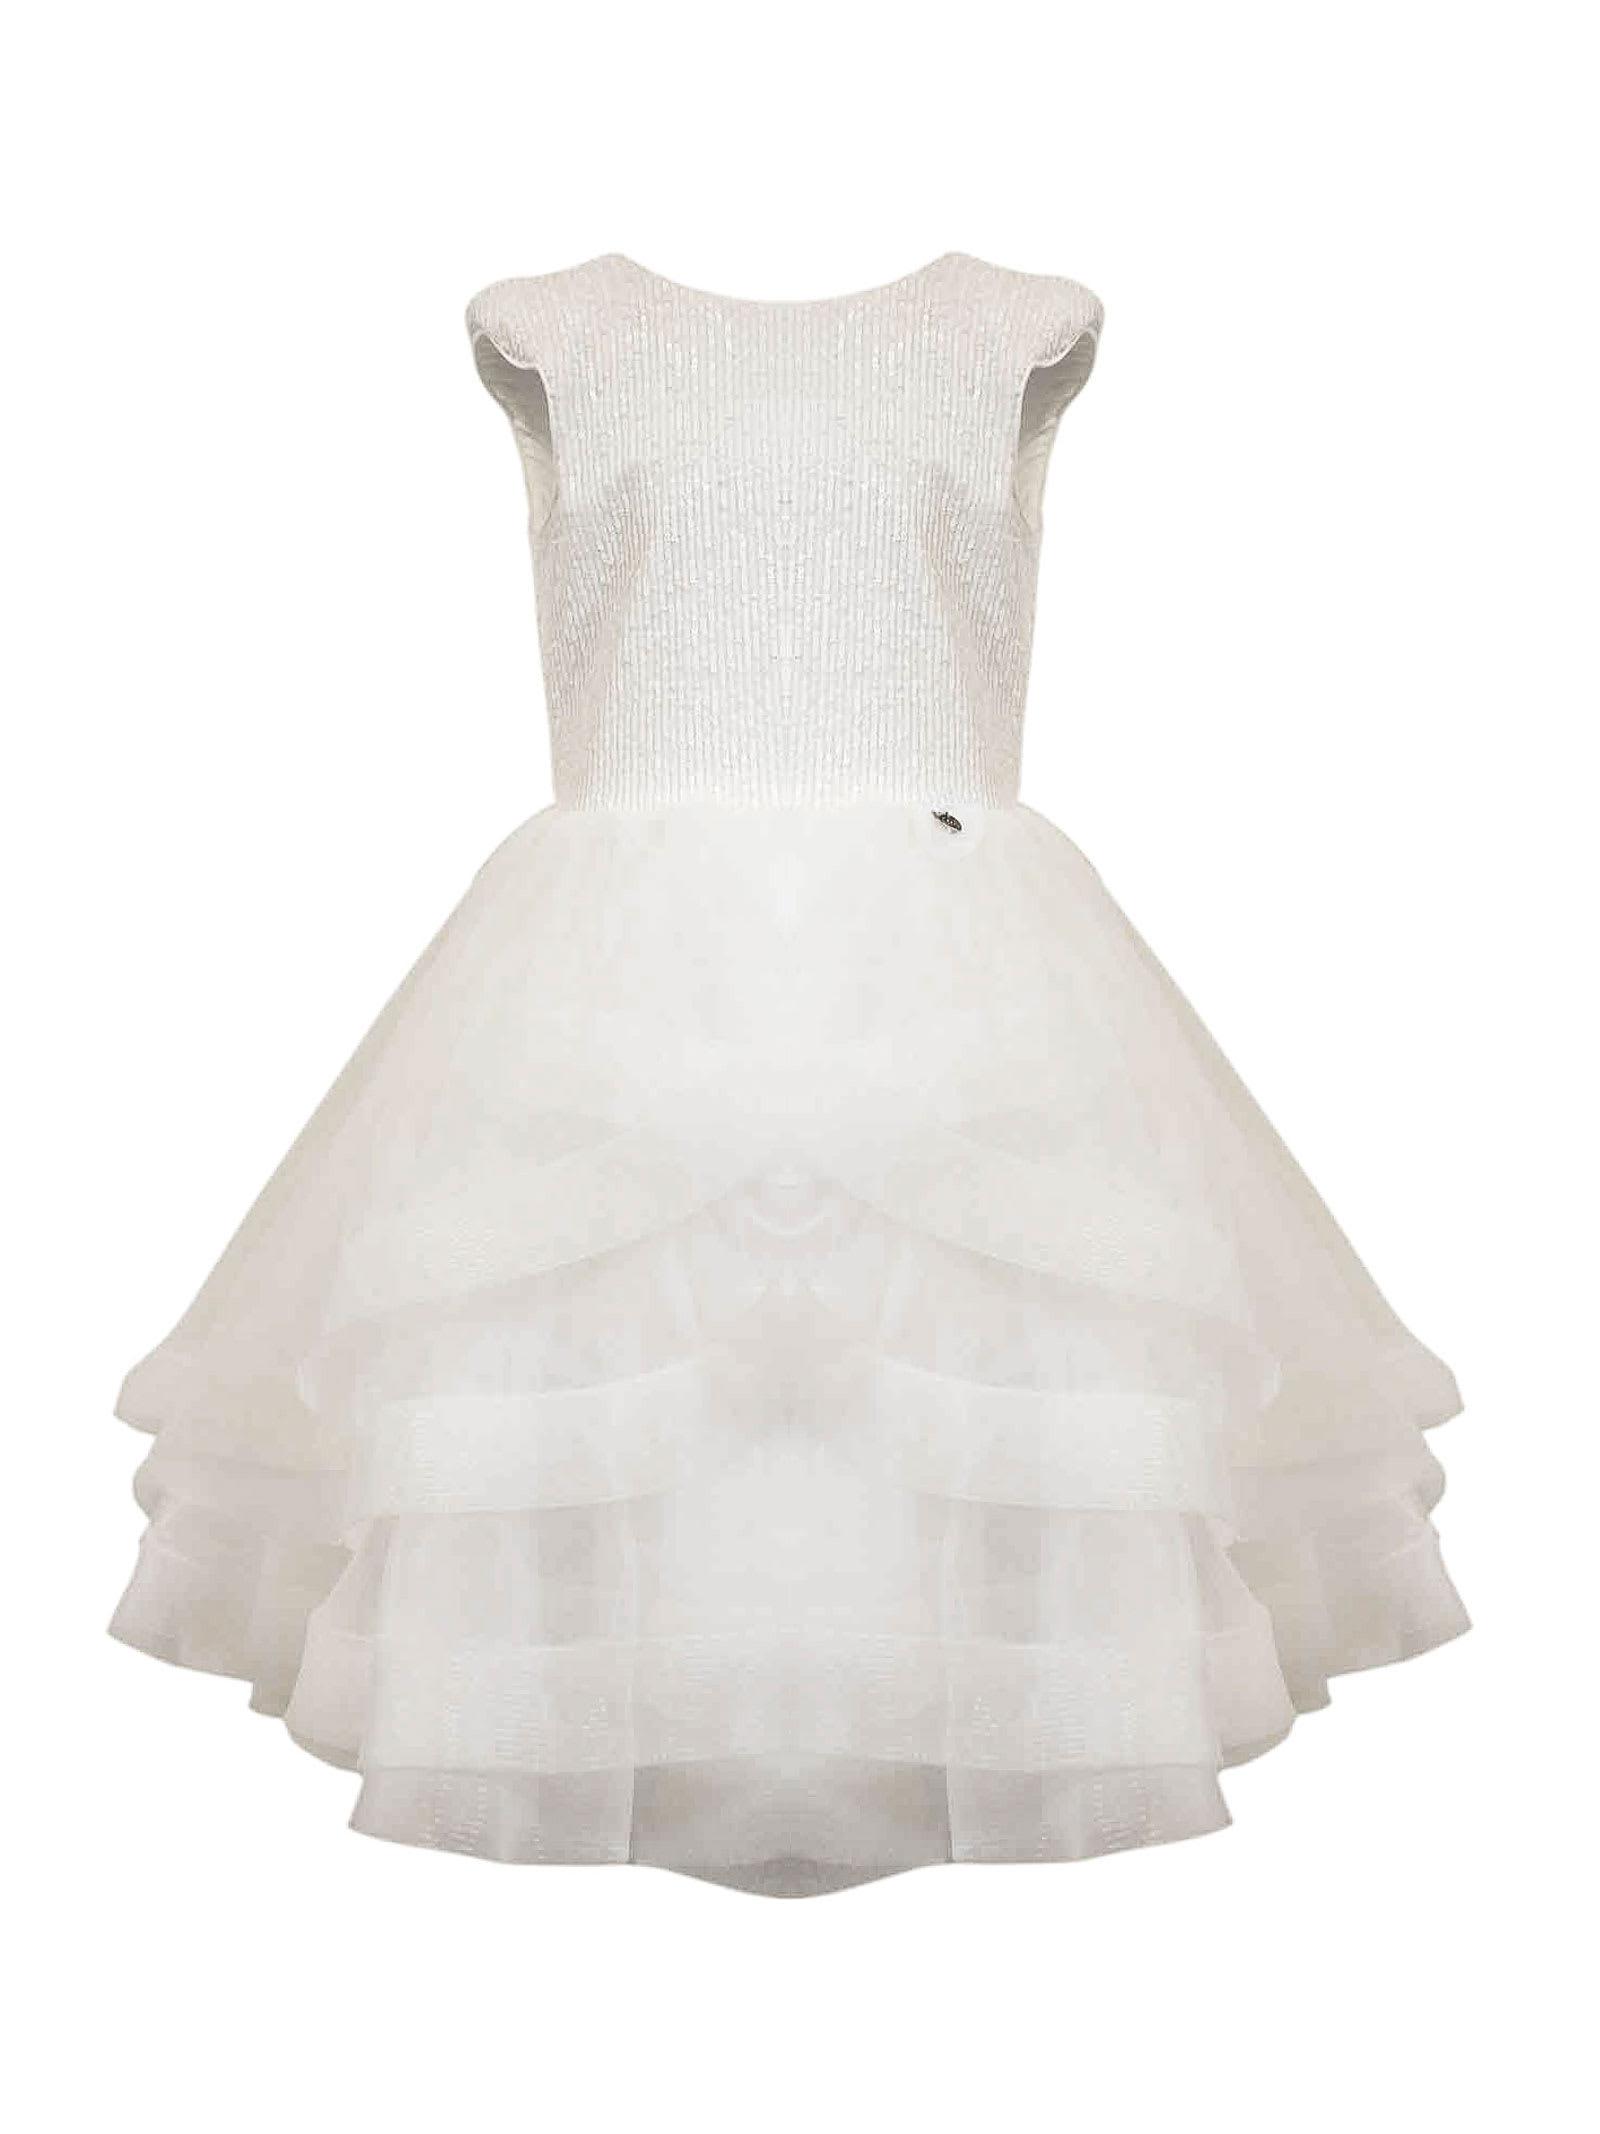 Buy Nunzia Corinna Cream Sequined Tulle Dress online, shop Nunzia Corinna with free shipping